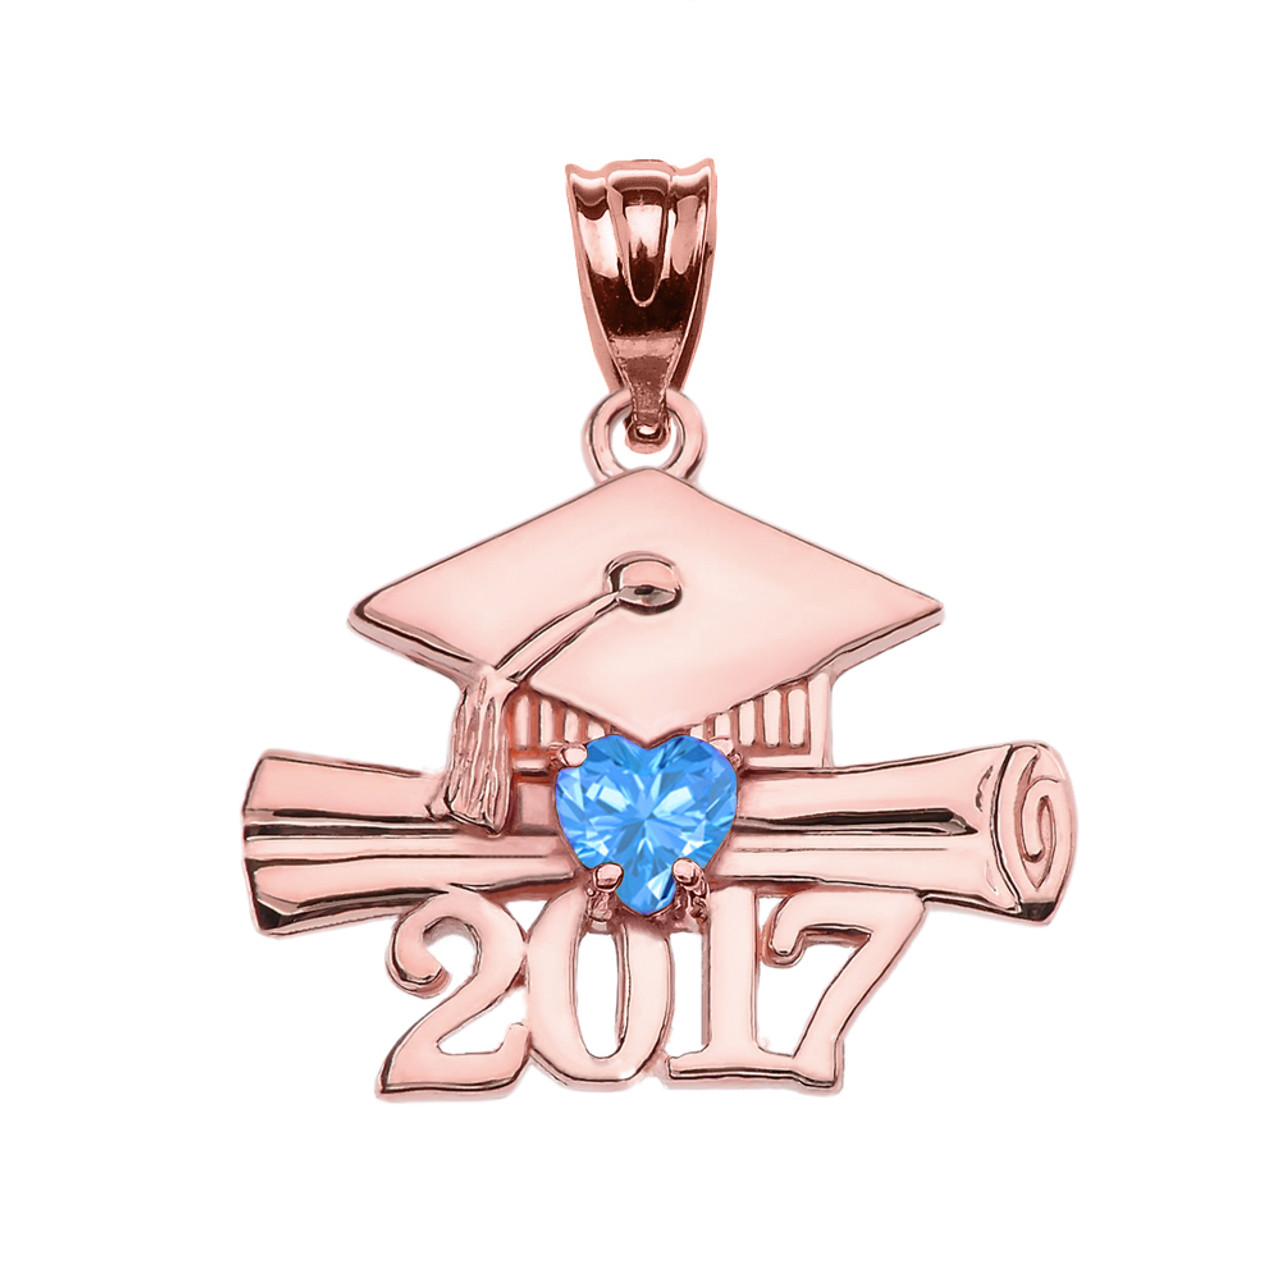 2017 Class Graduation Rose Gold Pendant Necklace